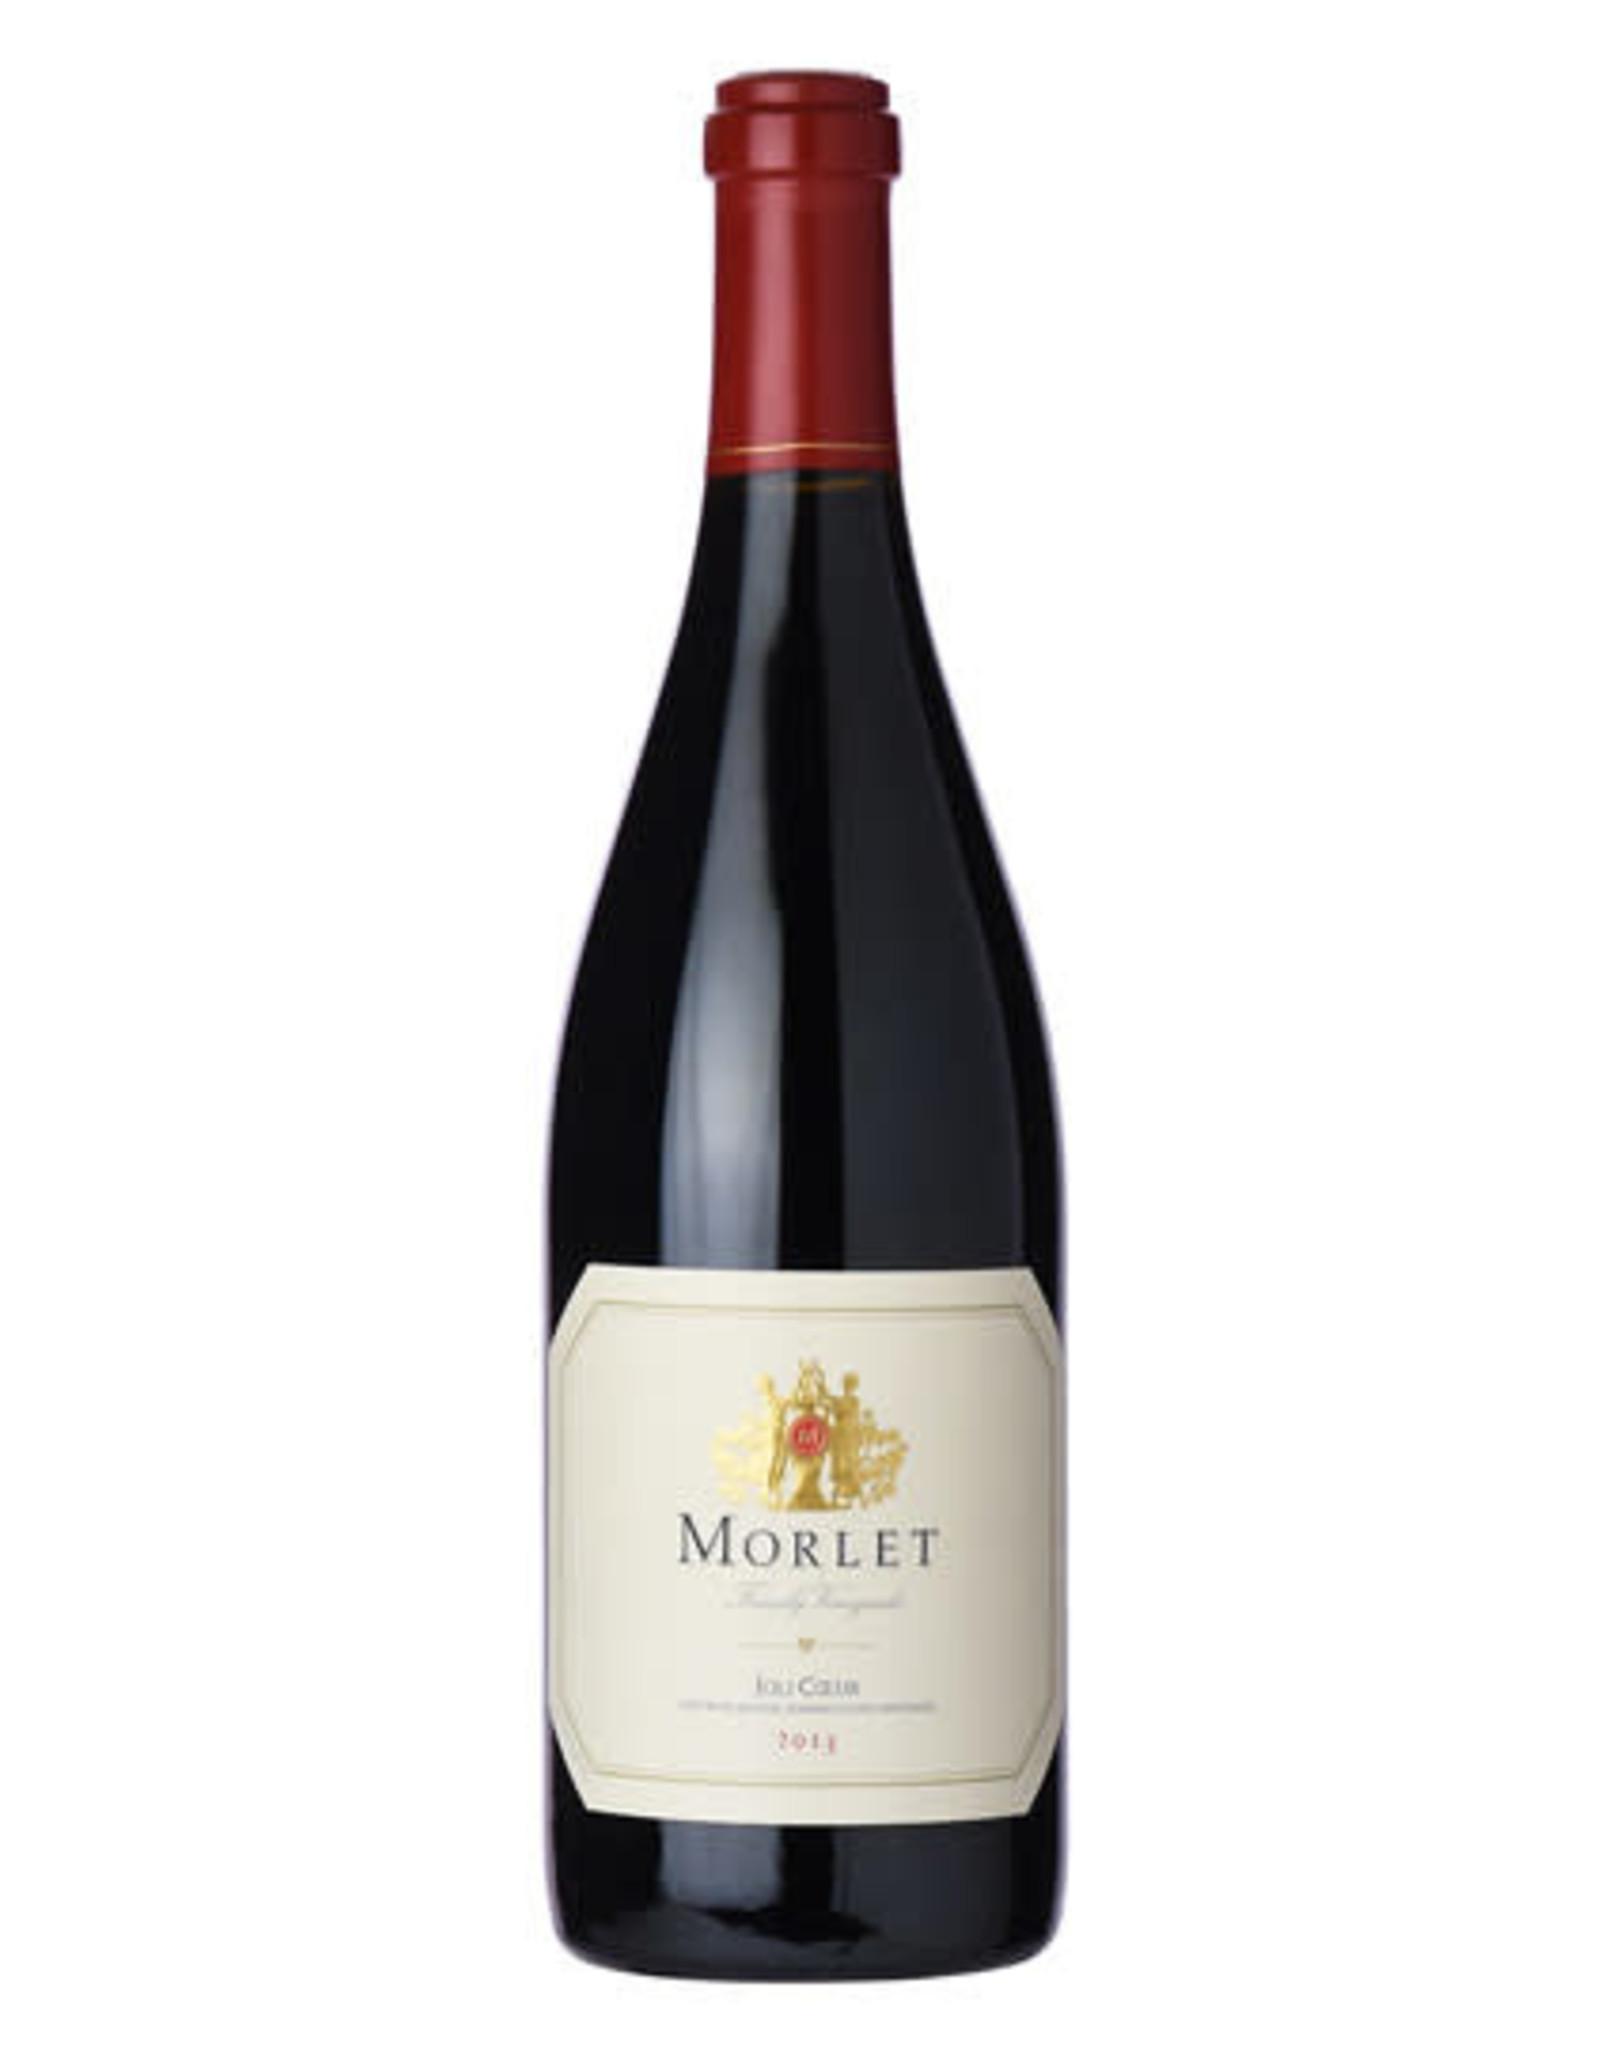 Morlet 'Joli Coeur' Pinot Noir, Fort-Ross Seaview 2013